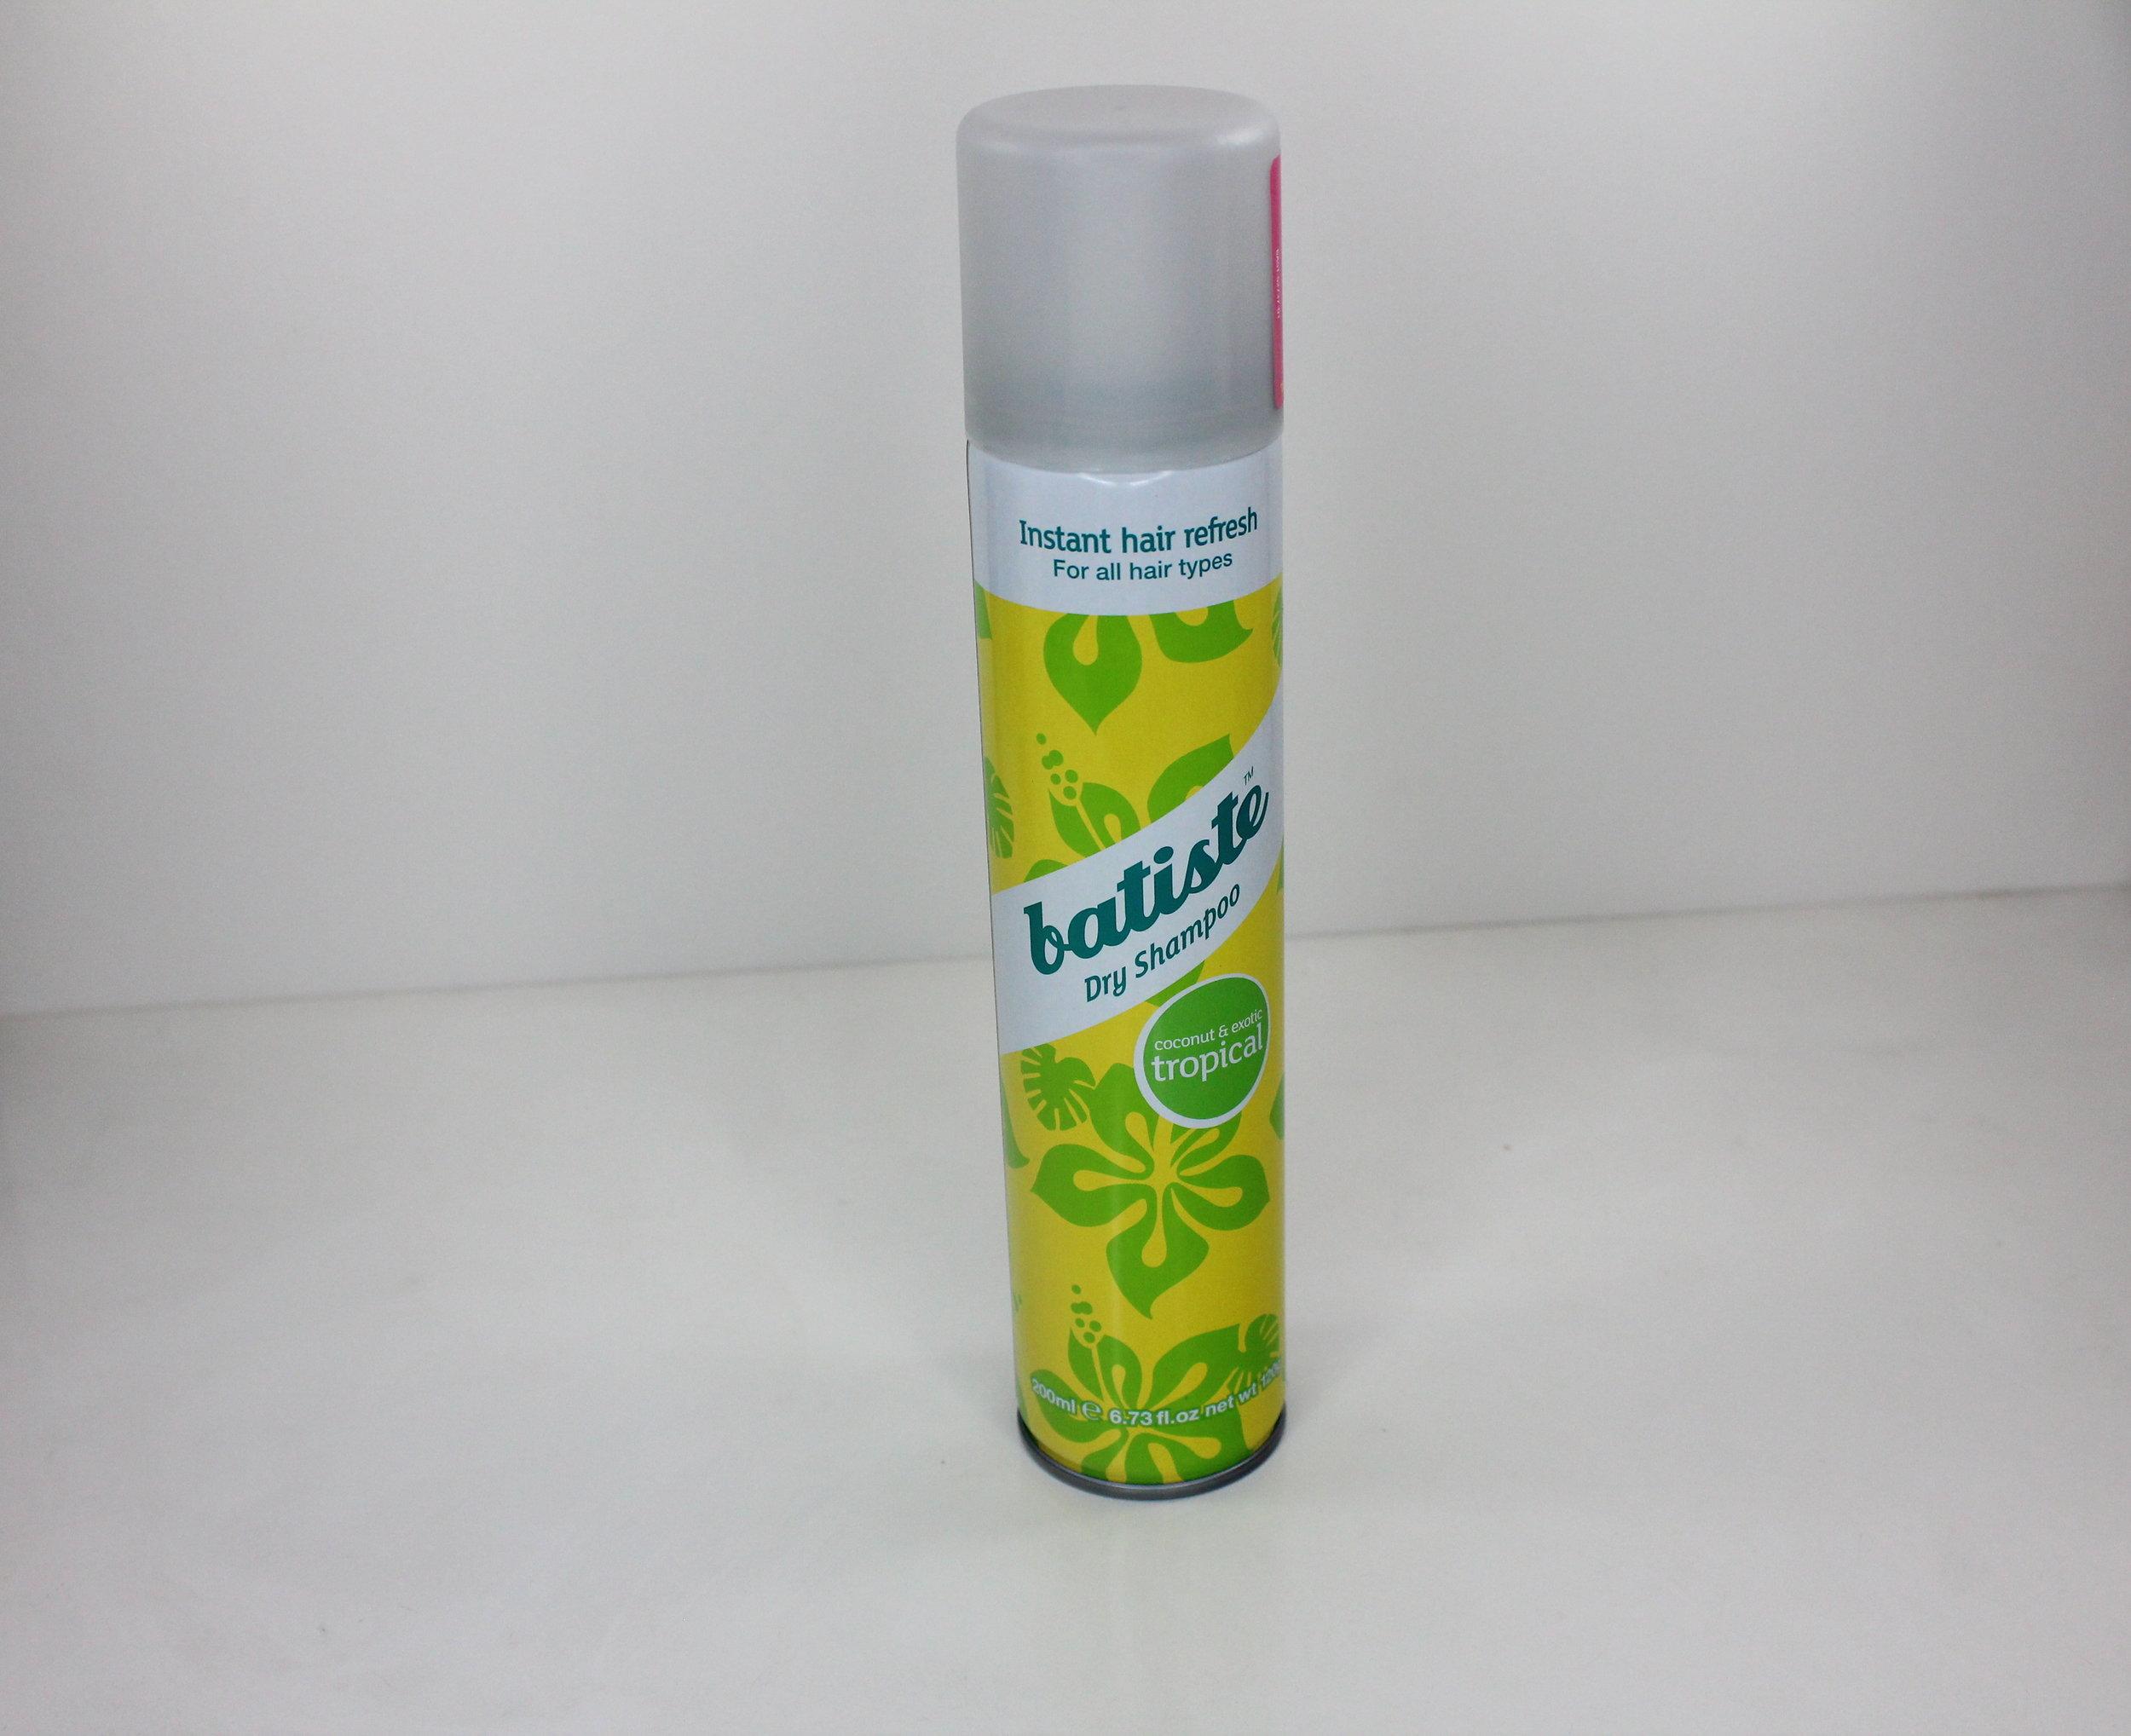 Ulta Haul - Batiste Dry Shampoo